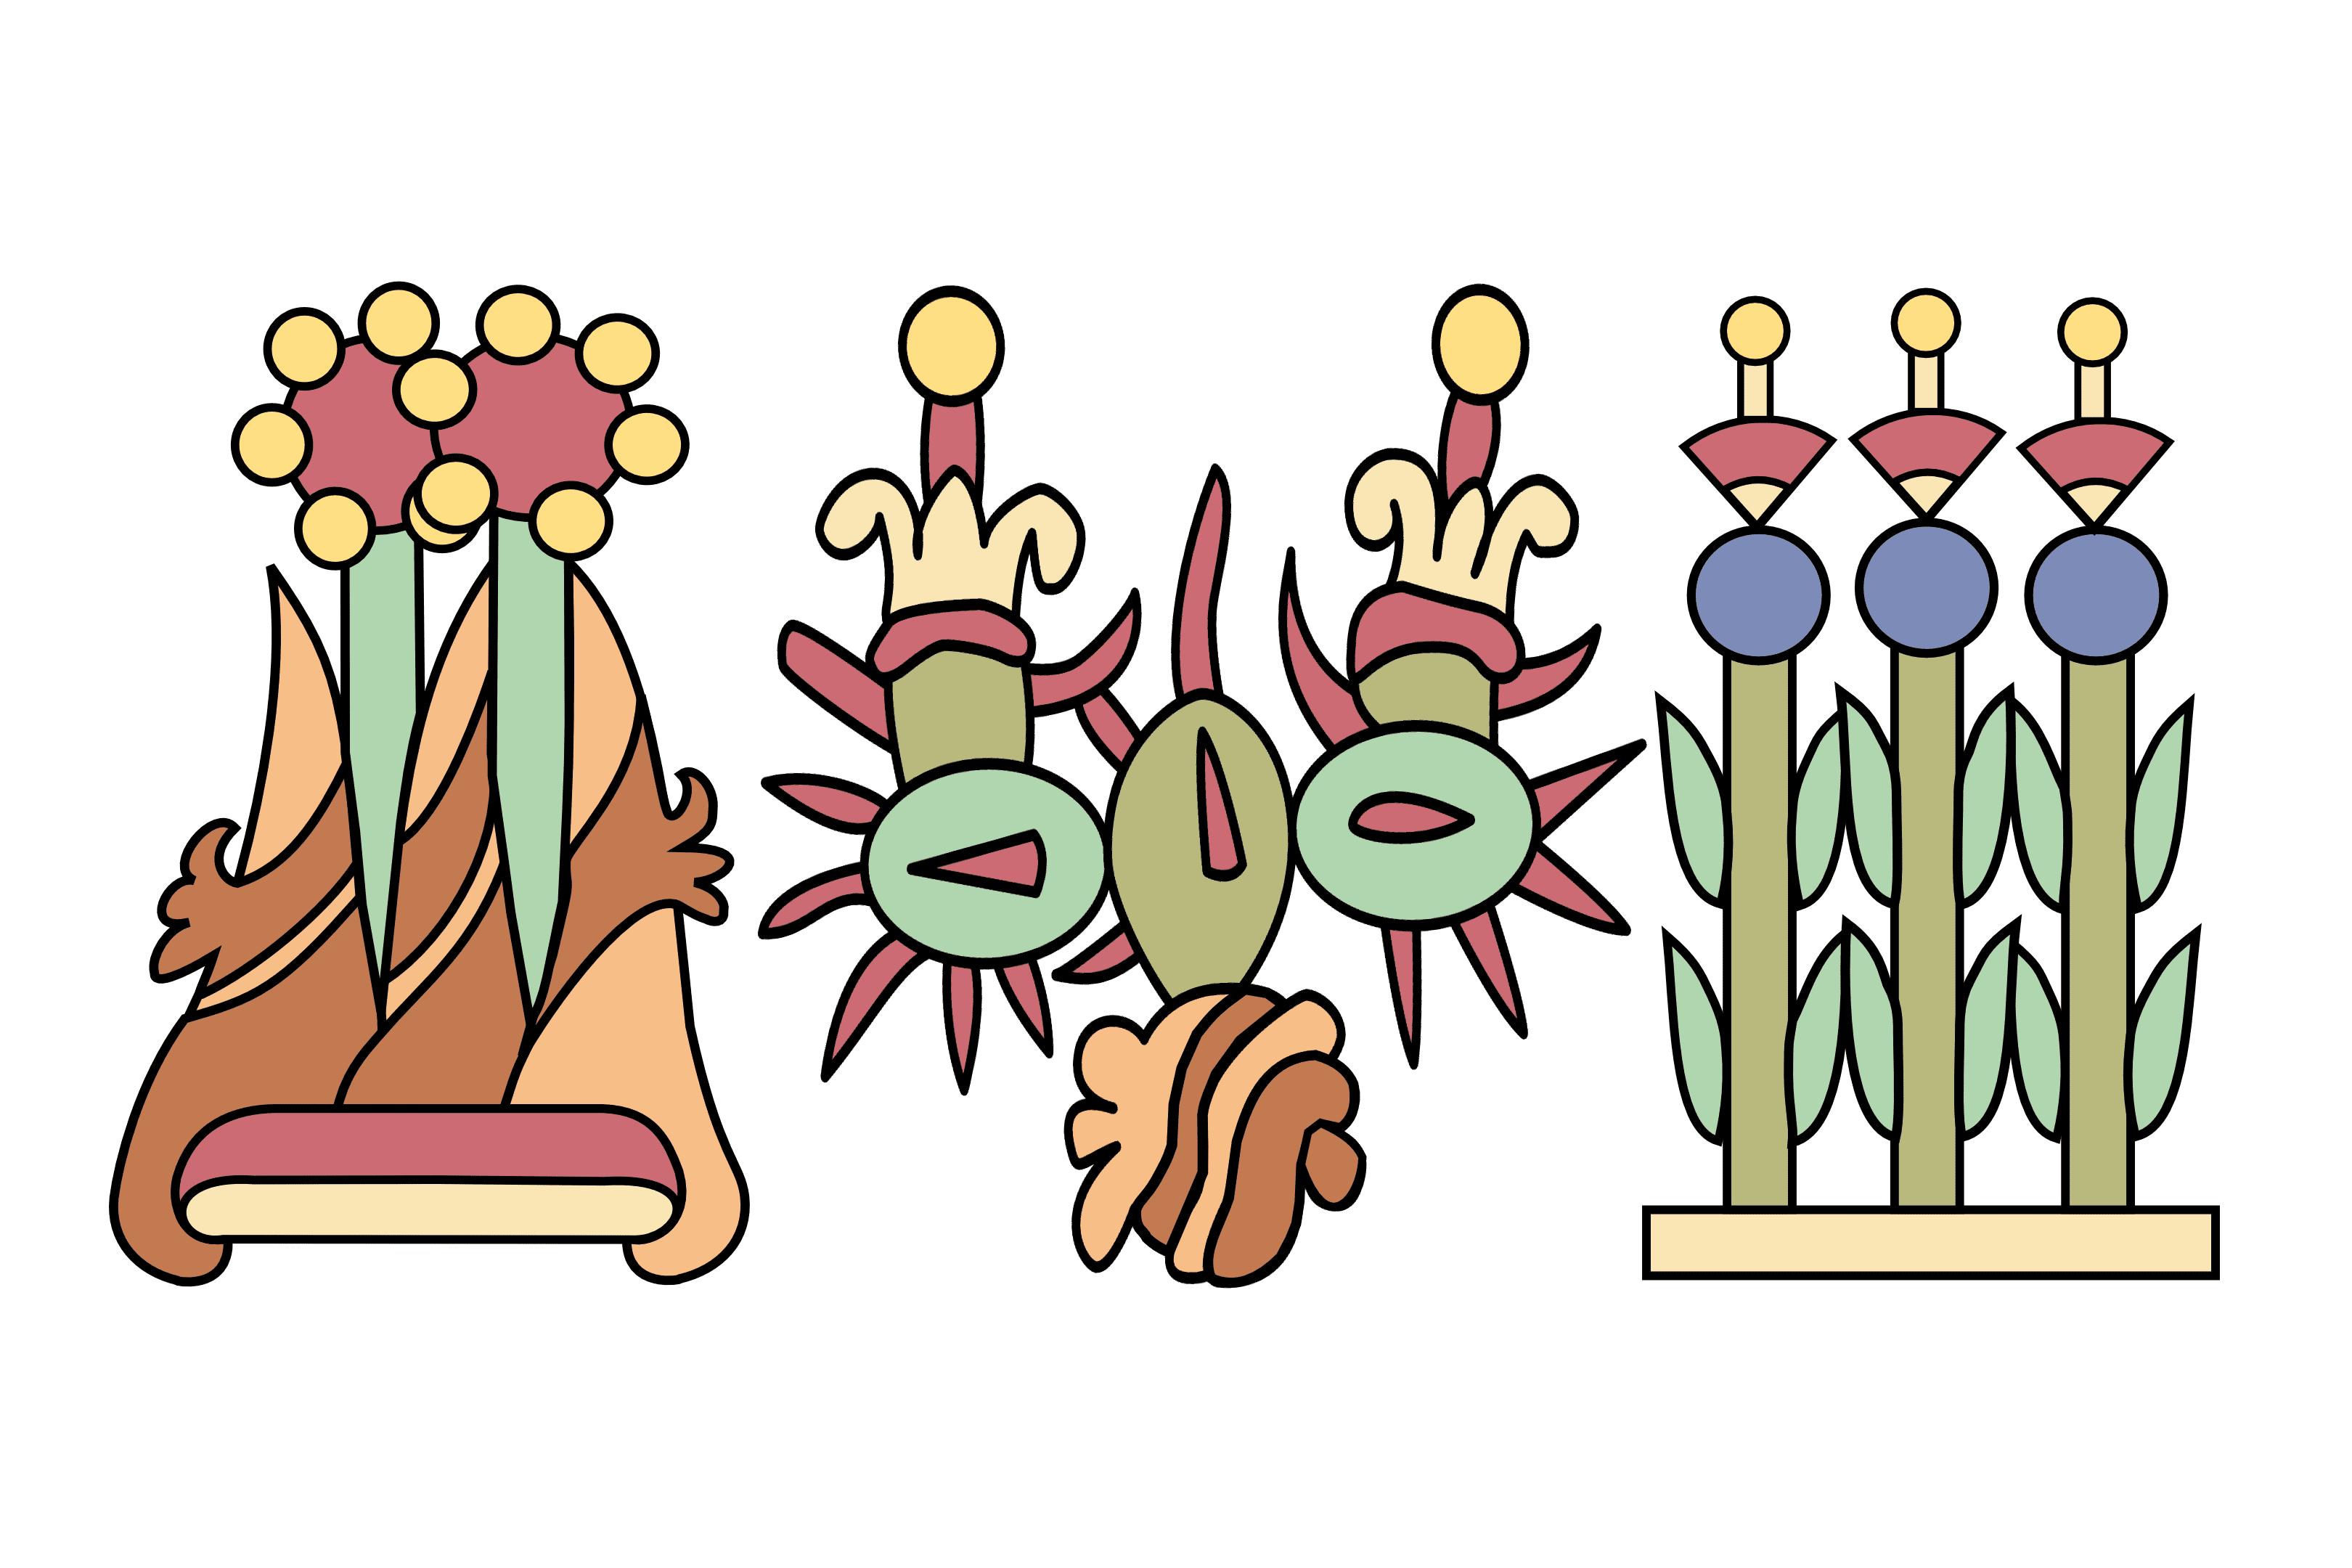 Aztec Glyphs for the Triple Alliance